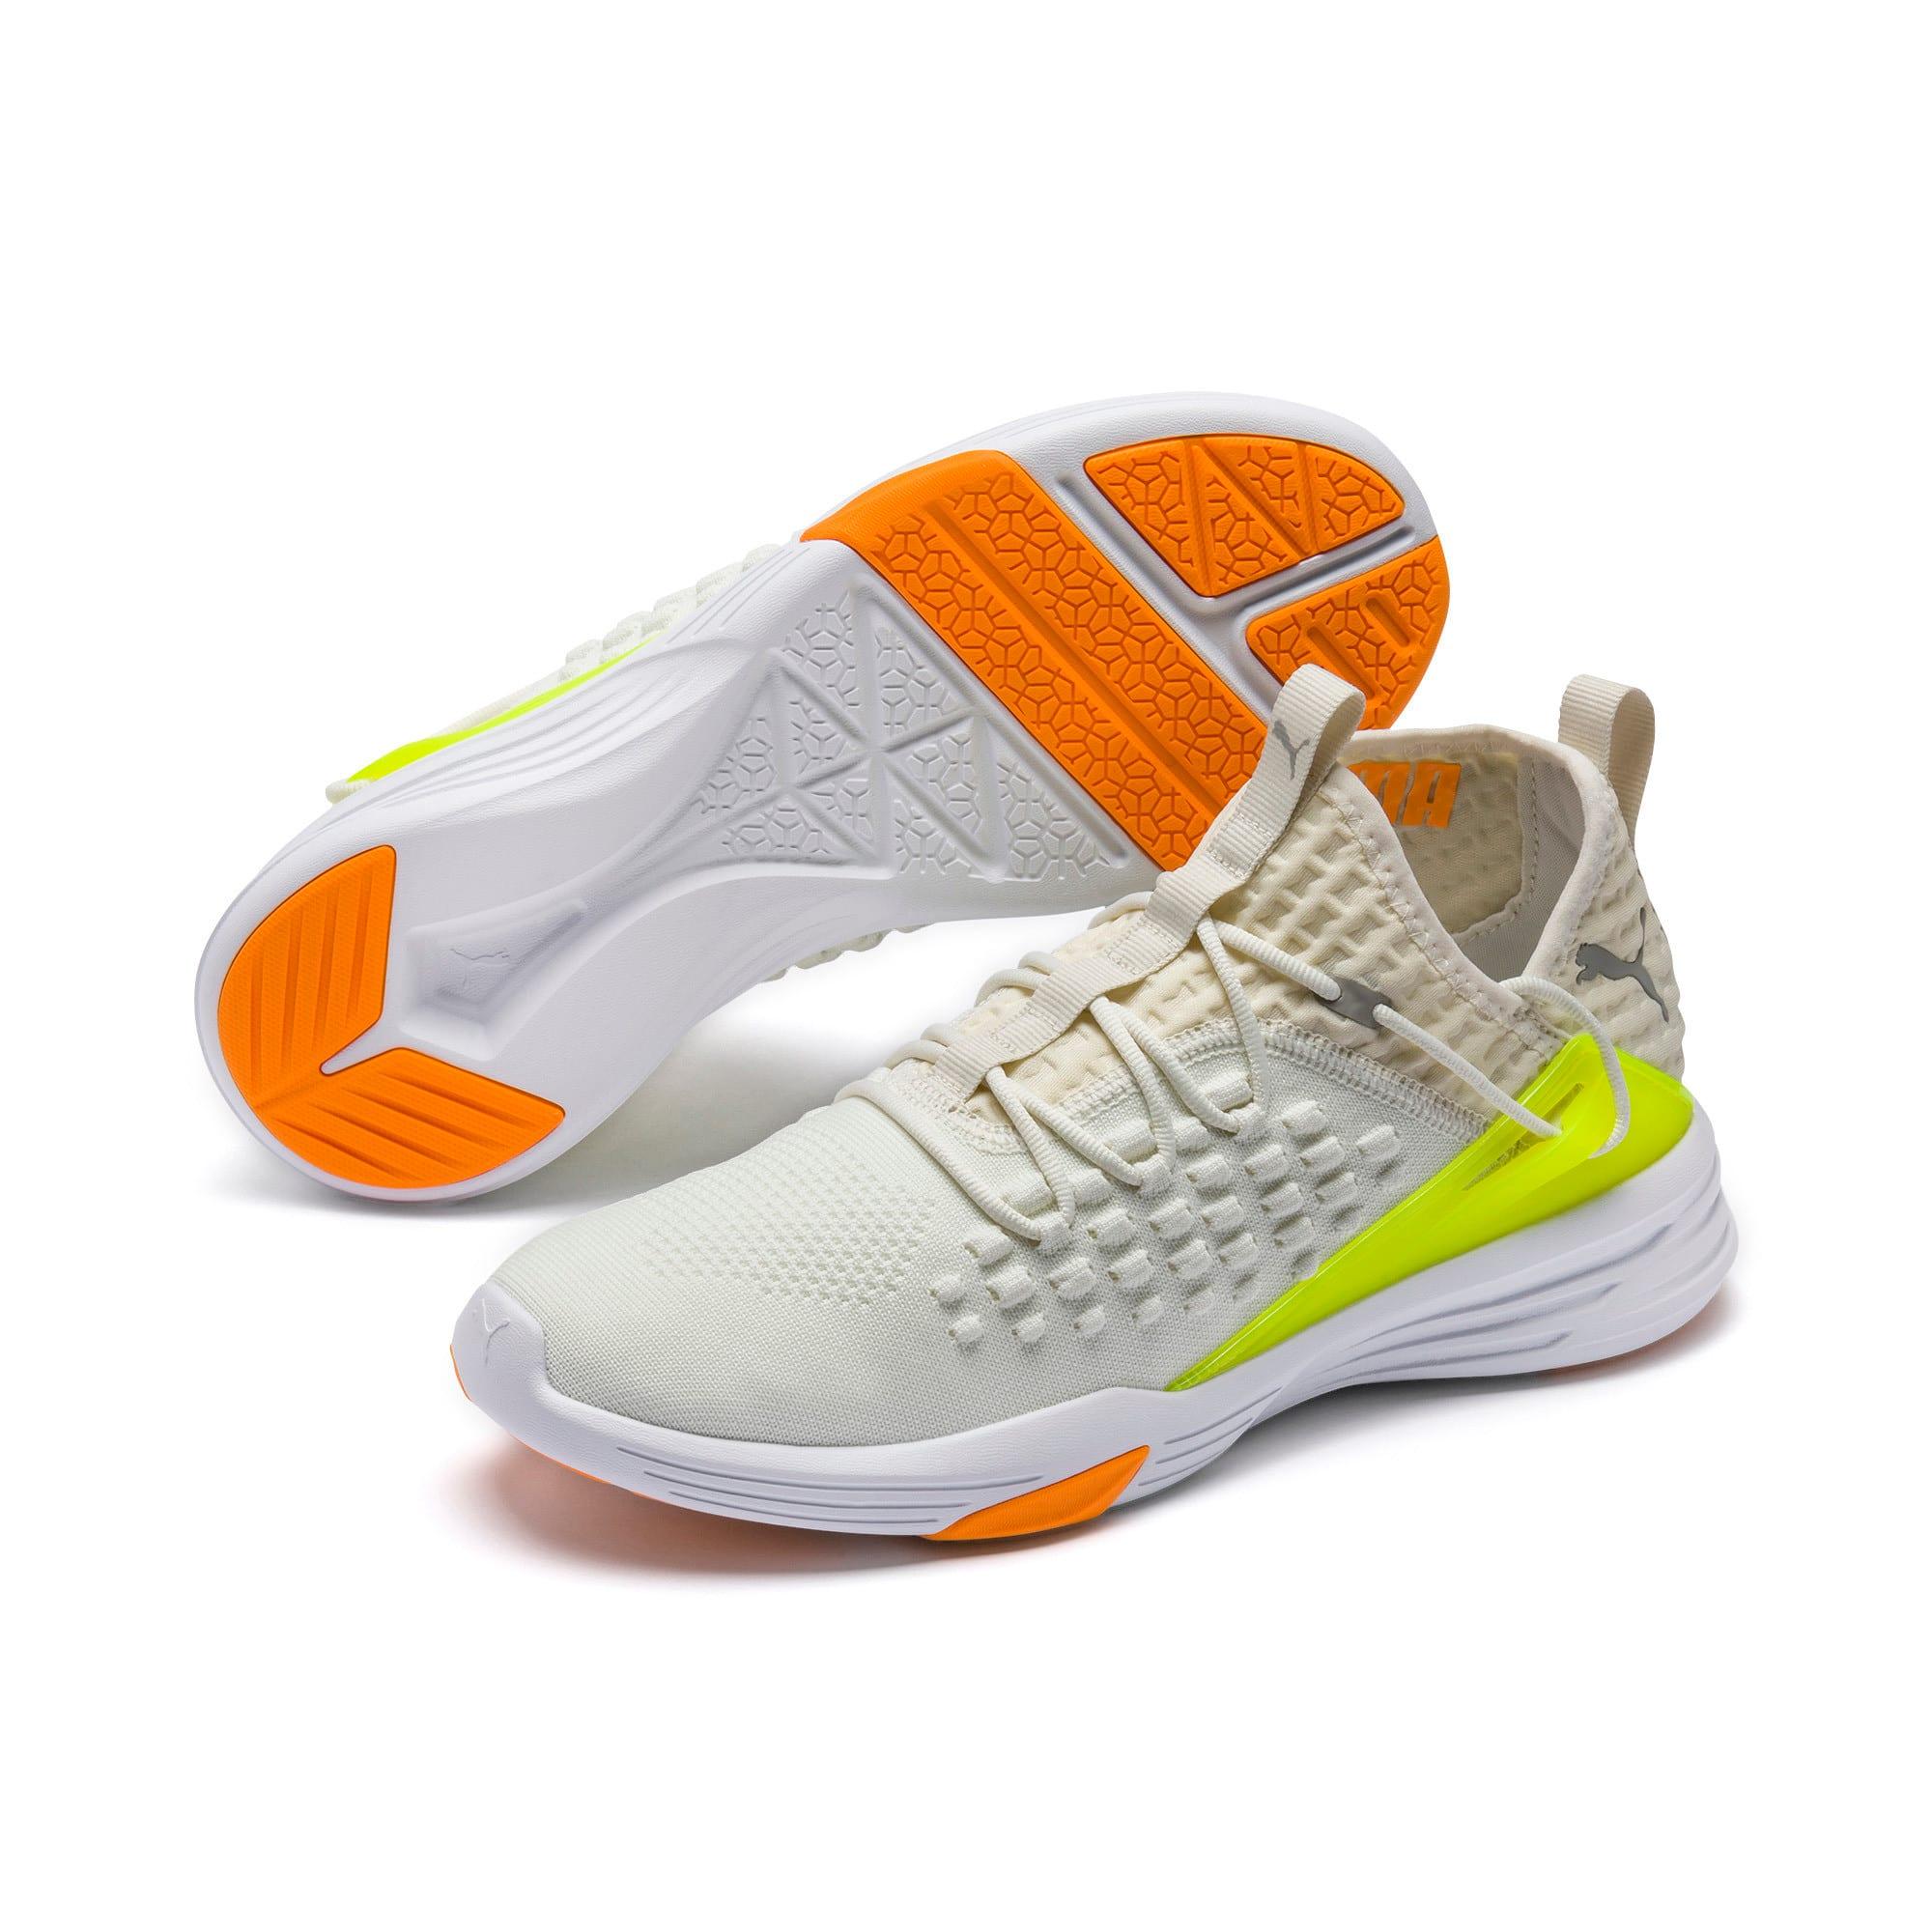 Thumbnail 2 of Mantra Daylight Men's Training Shoes, Vaporous Gray-Puma White, medium